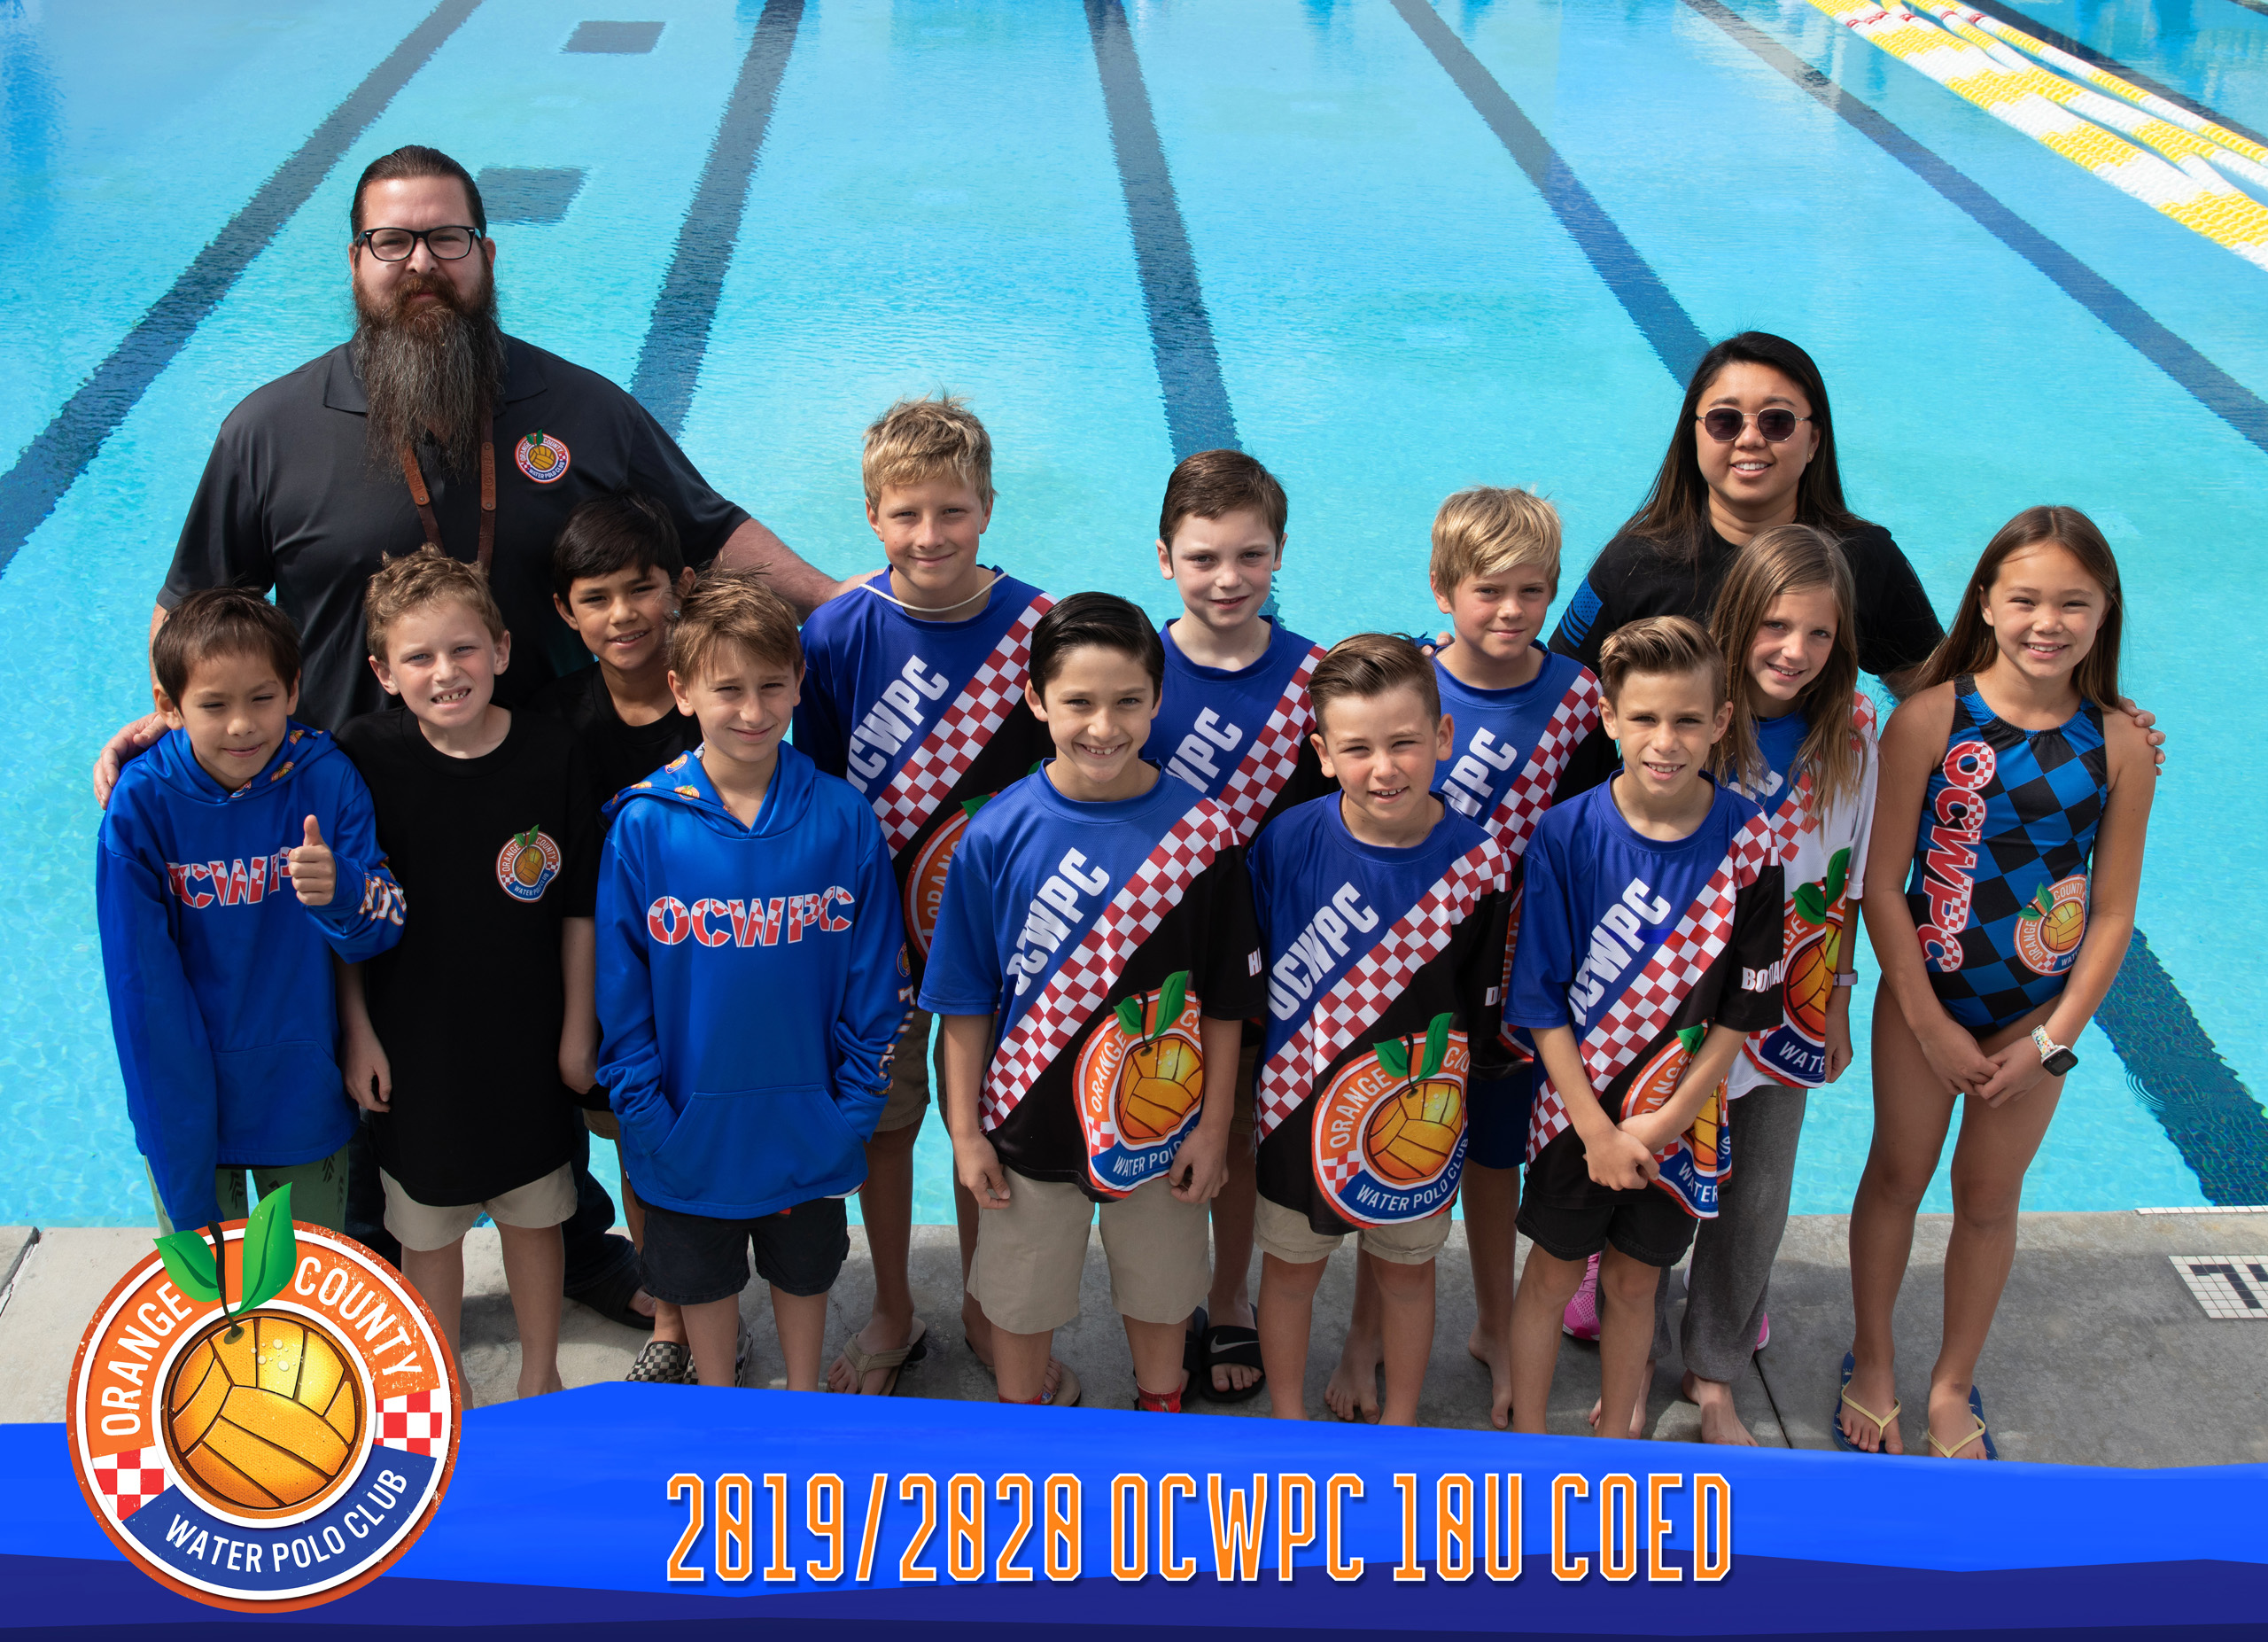 OCWPC-10U-Coed-Team-2020-02-29-Jeff-Kuecker_2-FINAL-MED